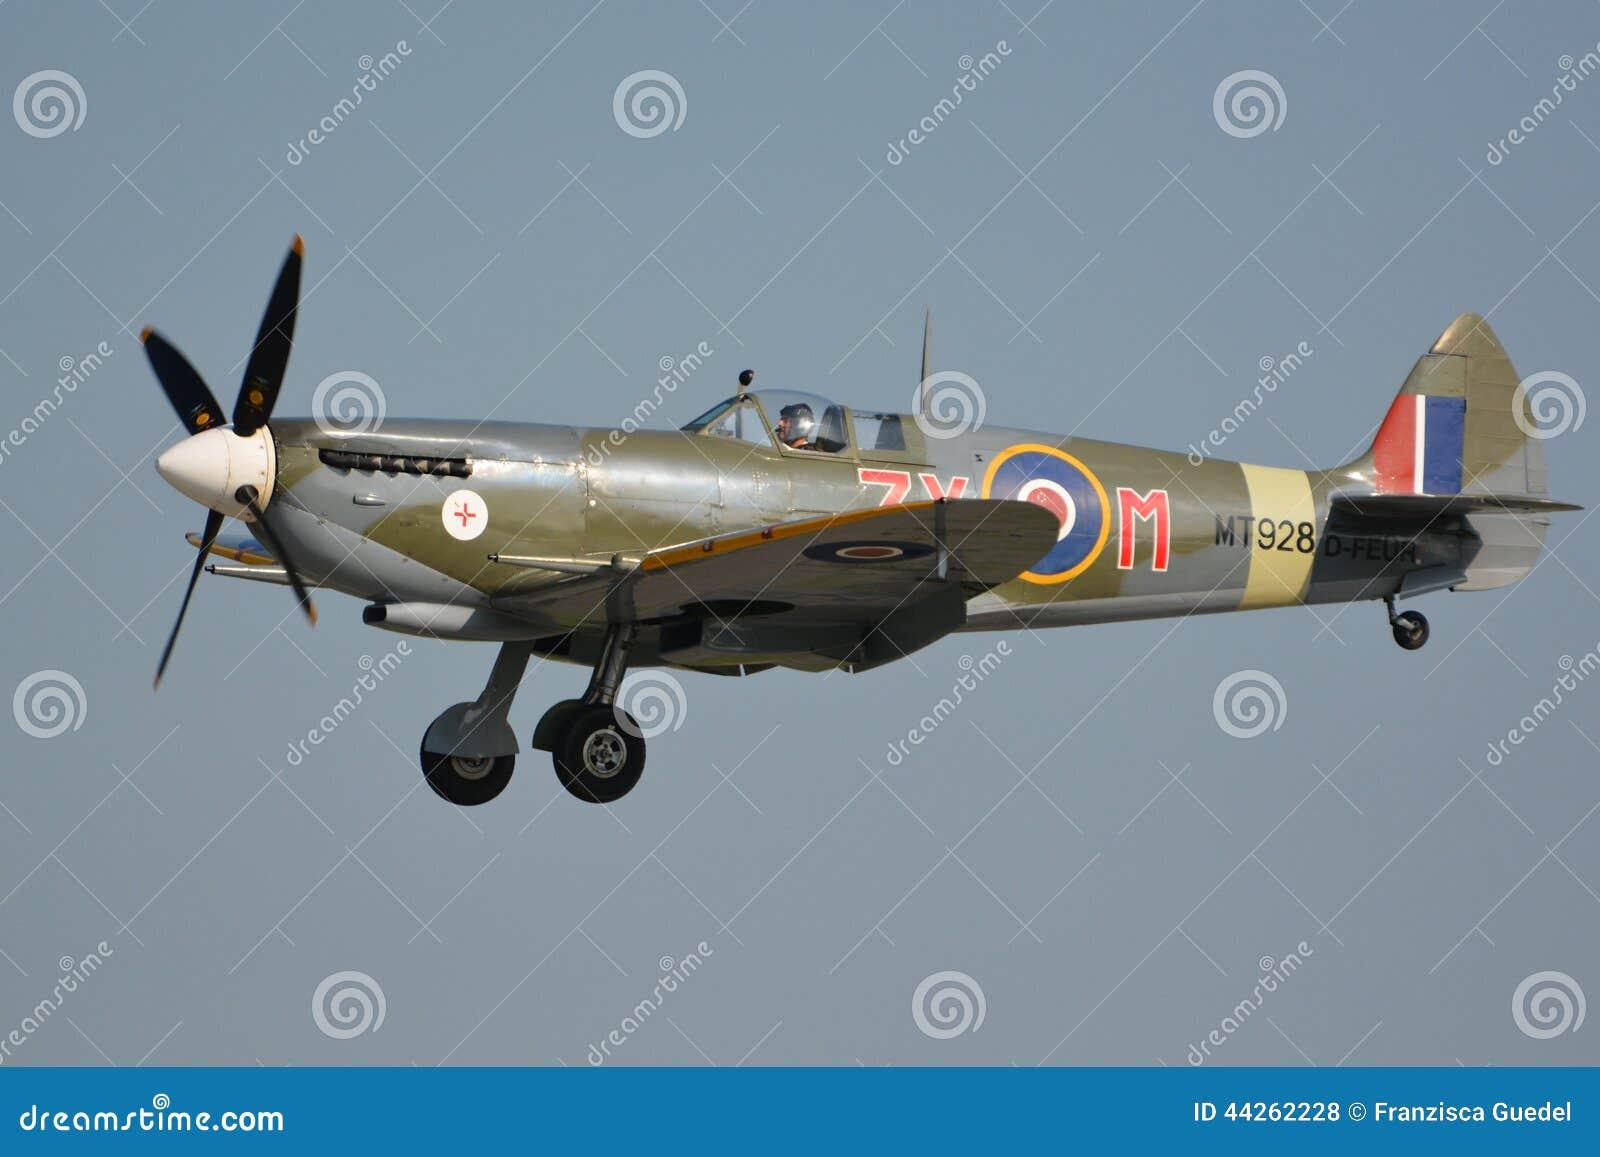 Trade Stands Duxford : Duxford flying legends spitfire mark viii mt d feur